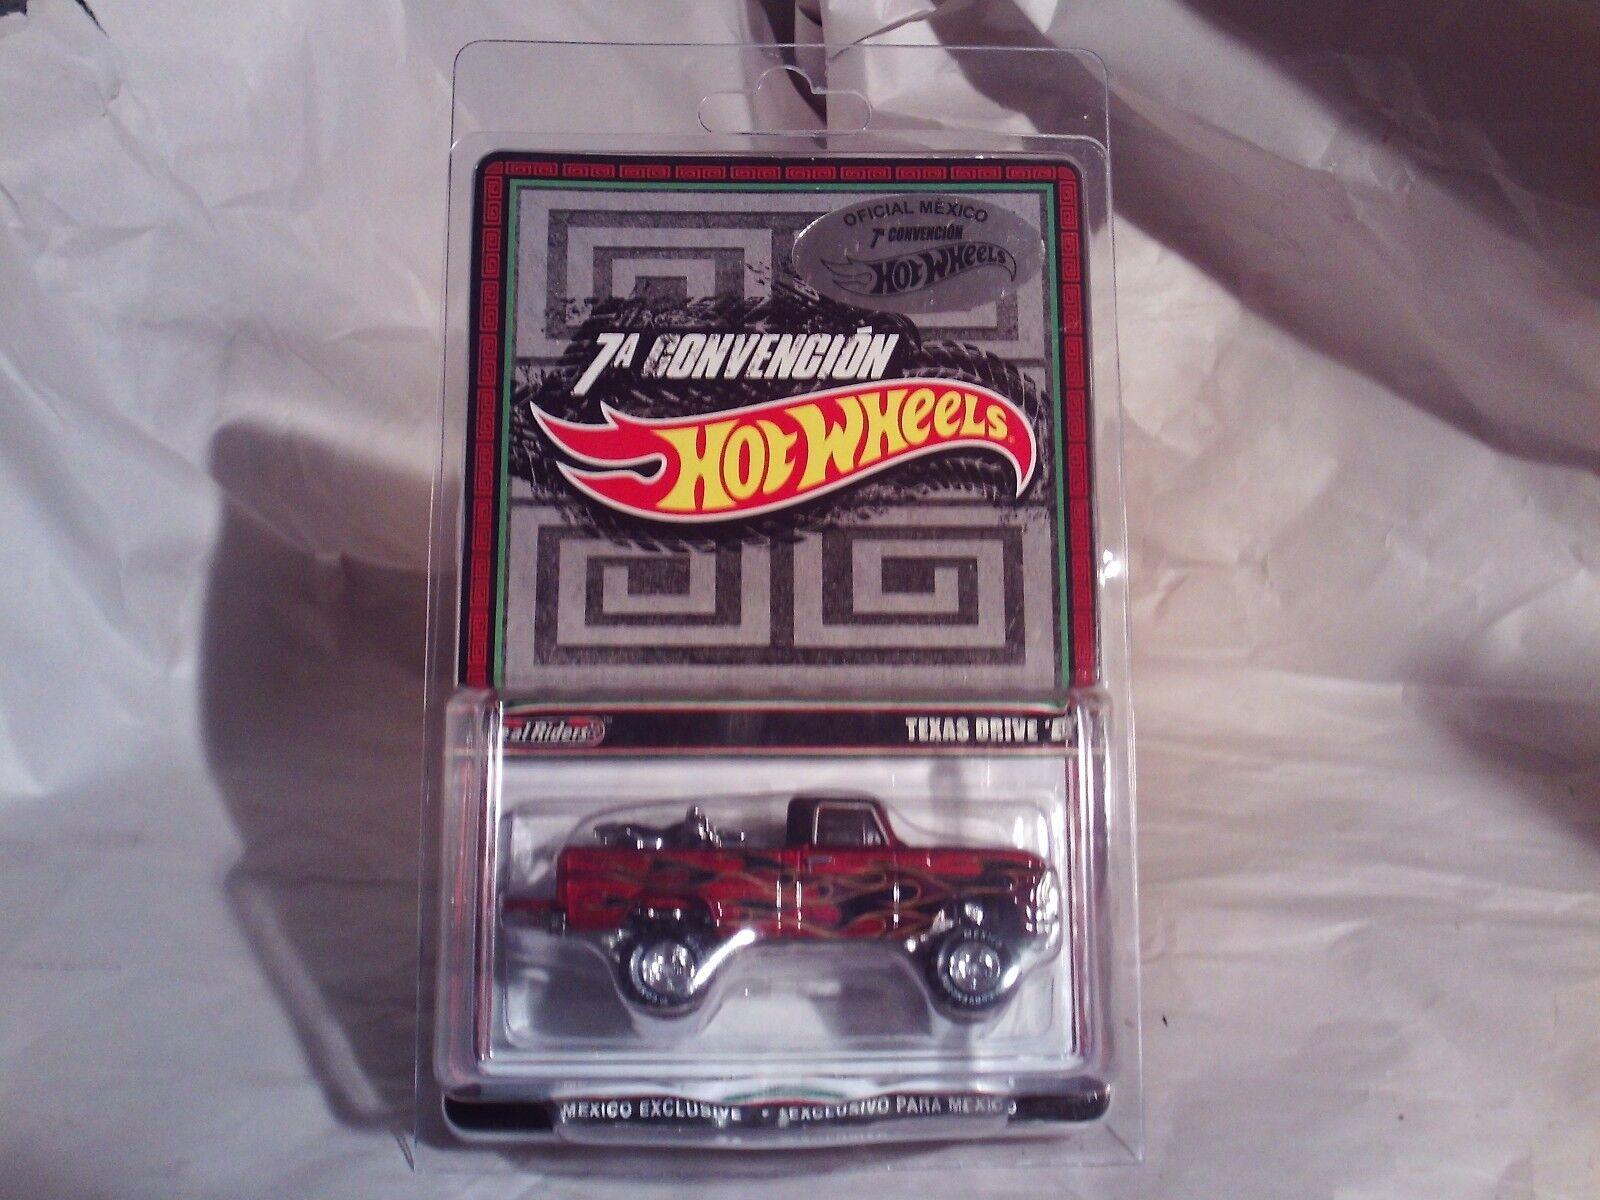 Rare Hot Wheels 2014 Mexico Convention Texas Drive 'Em In Predective Case